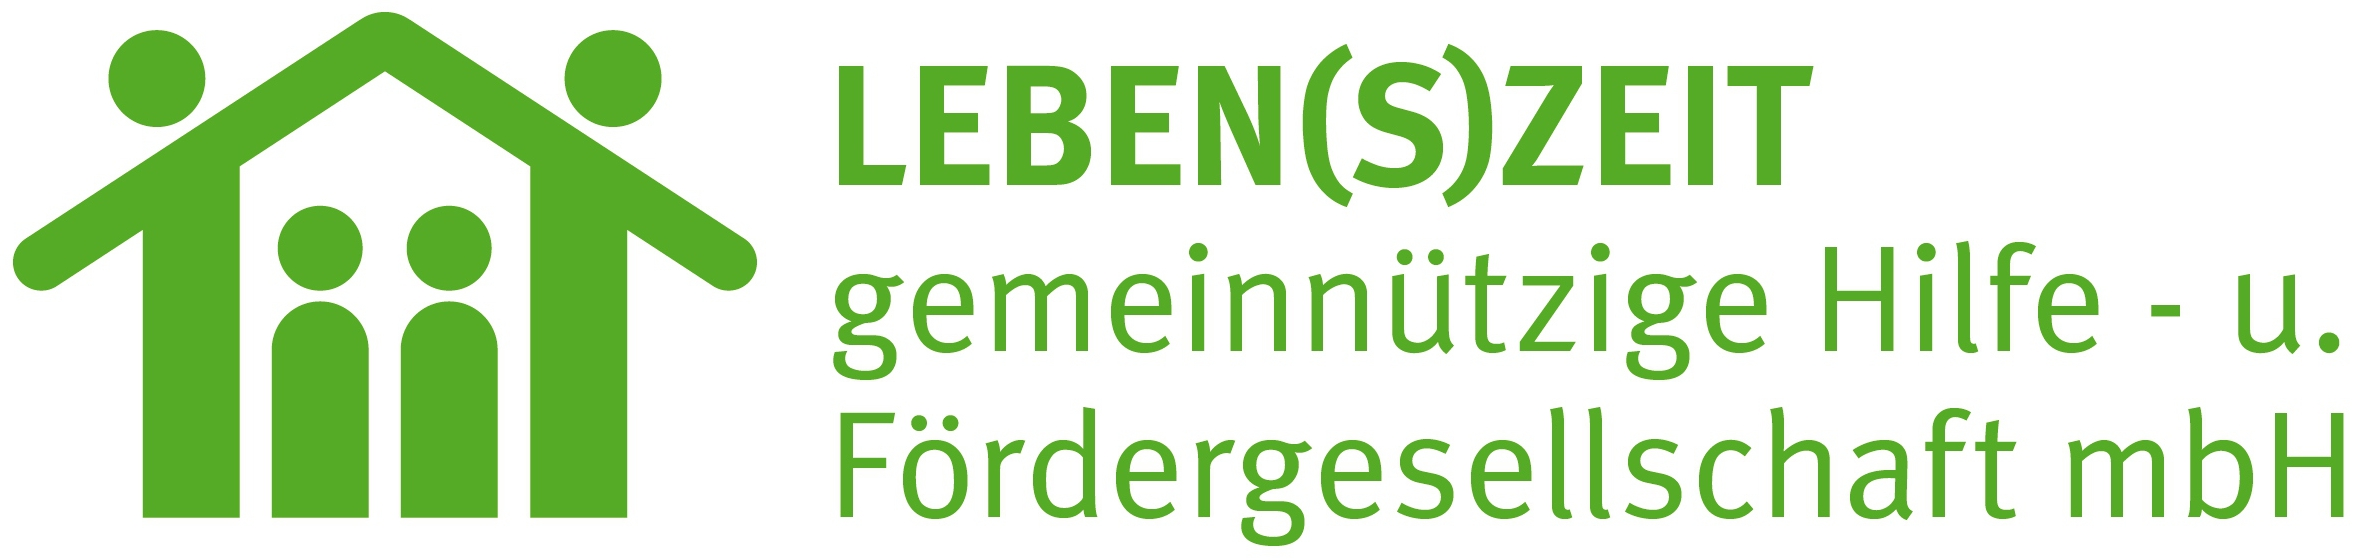 overlay-logo